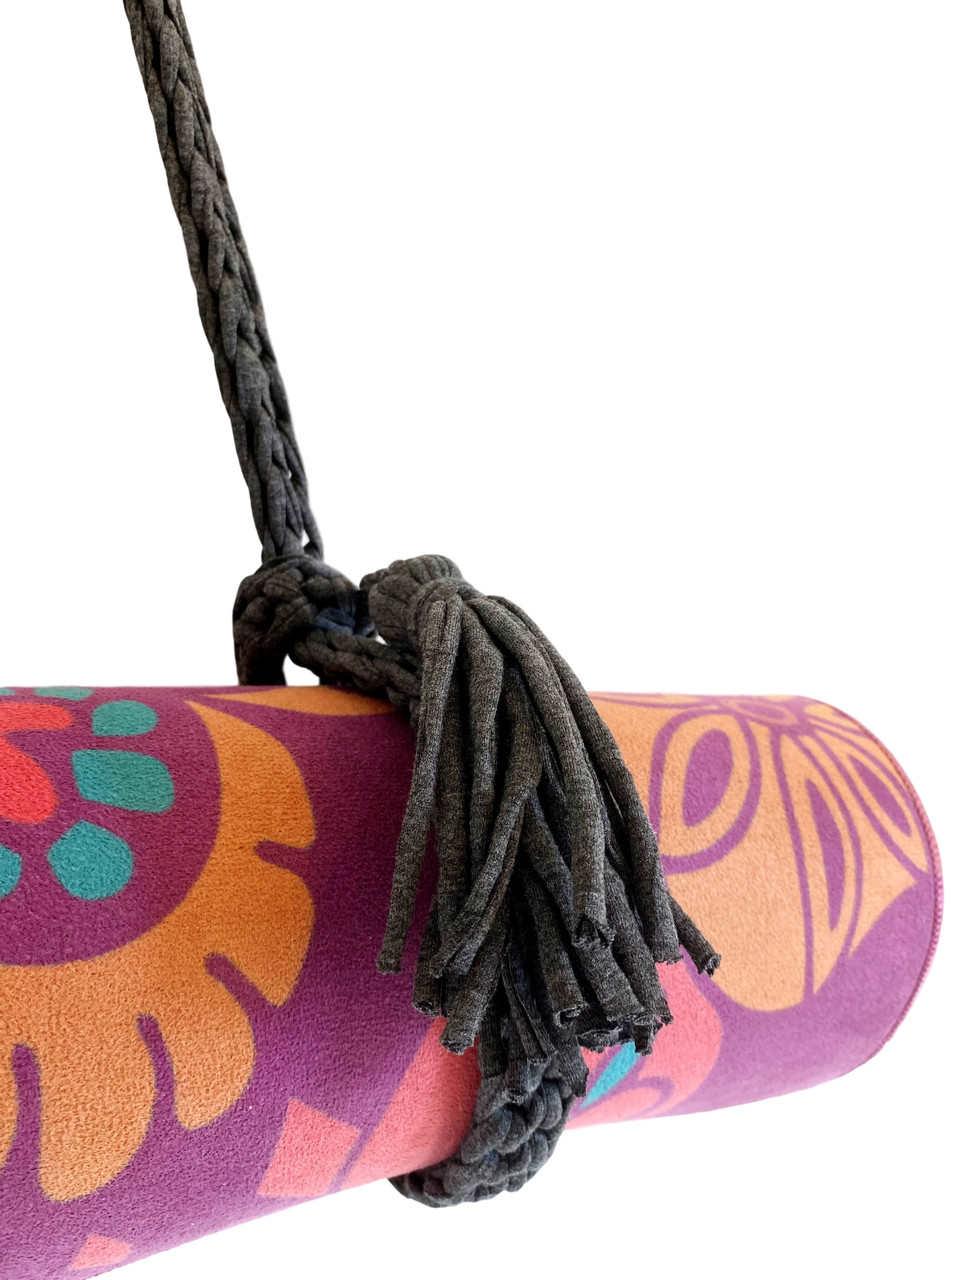 Porta Tapete - Crochê com ALÇA LARGA (Produto artesanal)